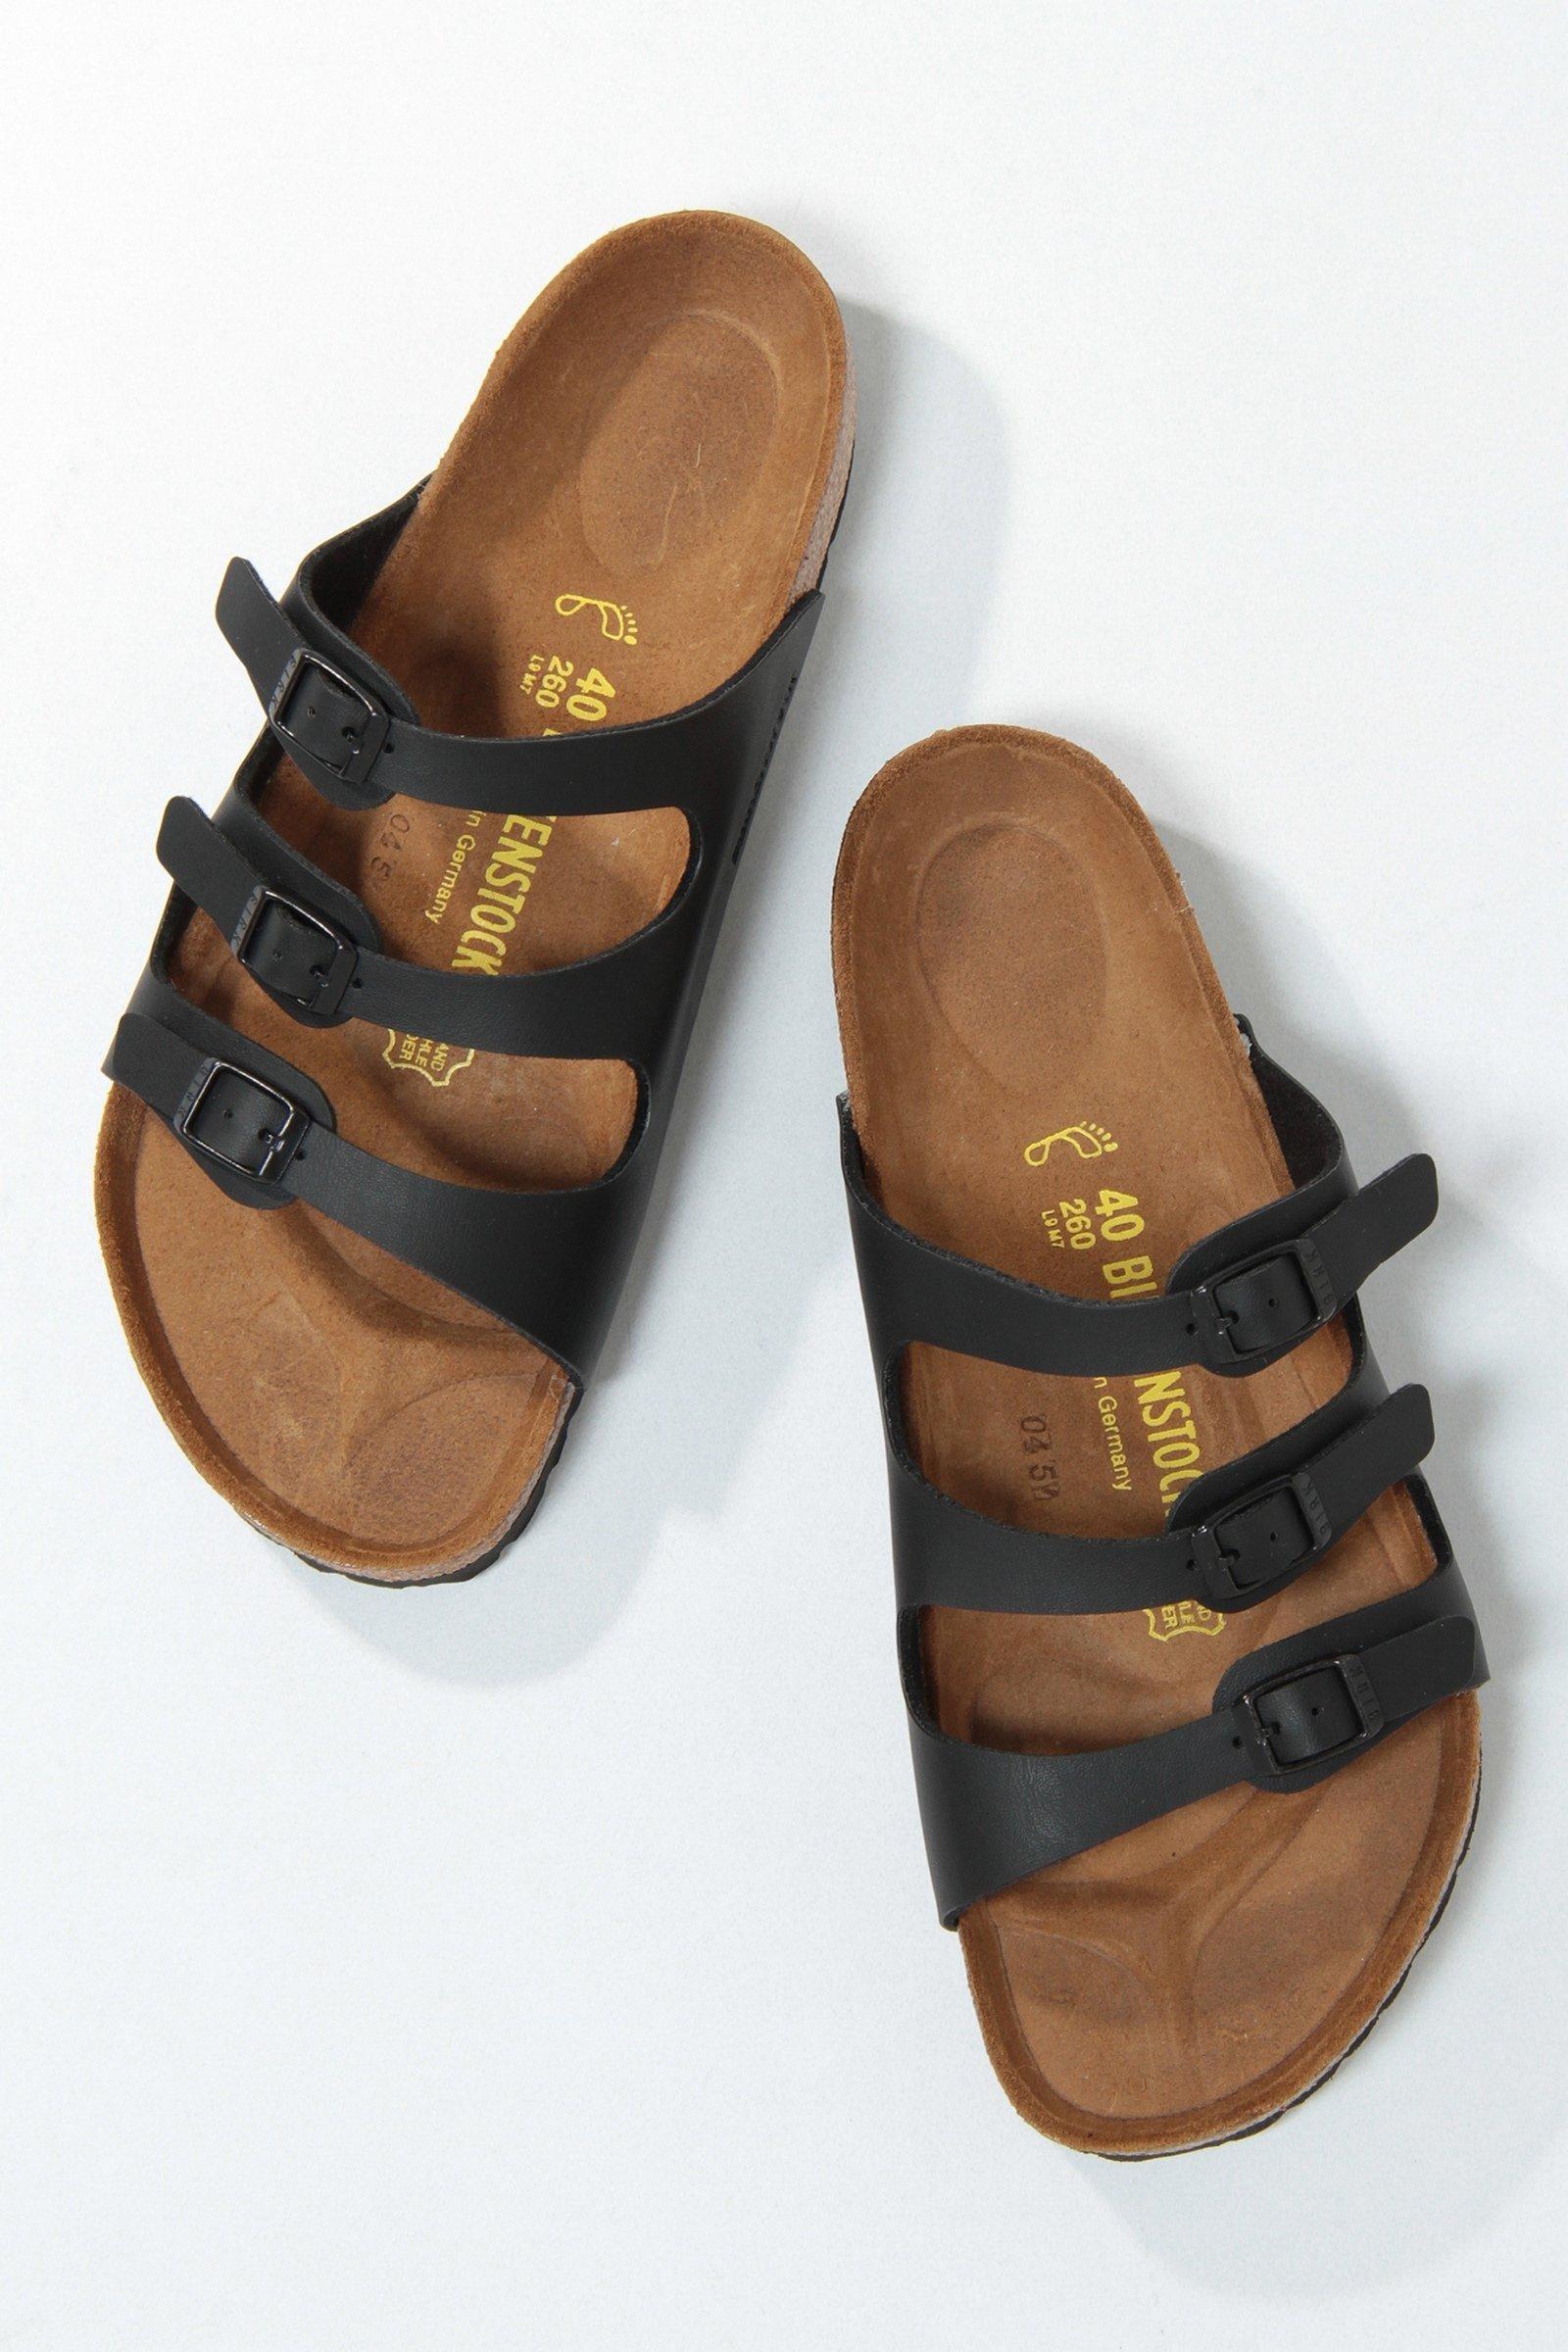 【BIRKENSTOCK】 ビルケンシュトック FRORIDA【ファッション・アパレル 靴メンズ】/ikka【イッカ】/11830376【コックス公式オンラインショップ】